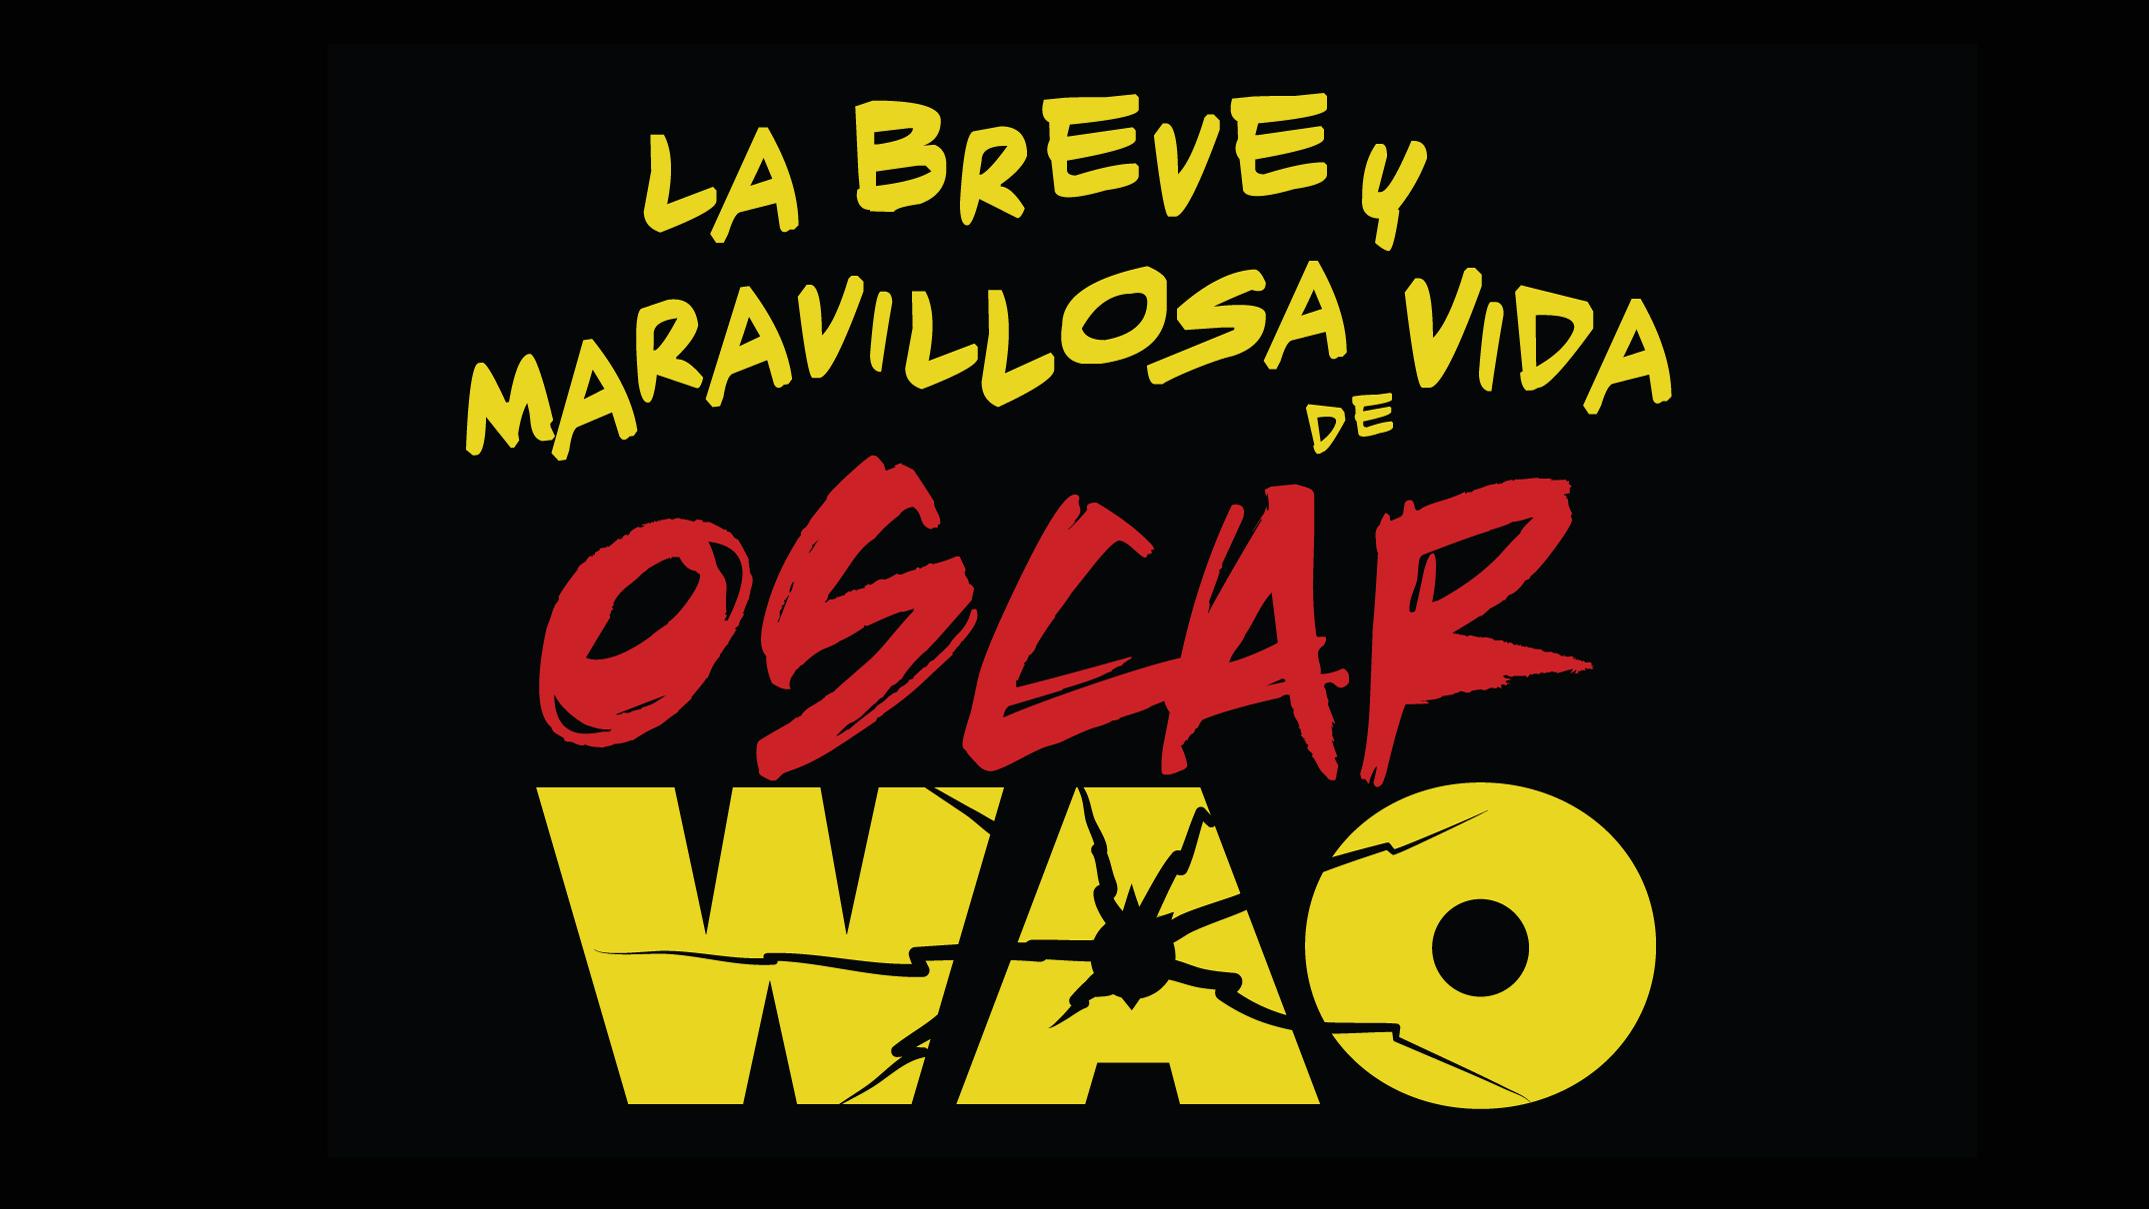 Facebook Event Oscar Wao